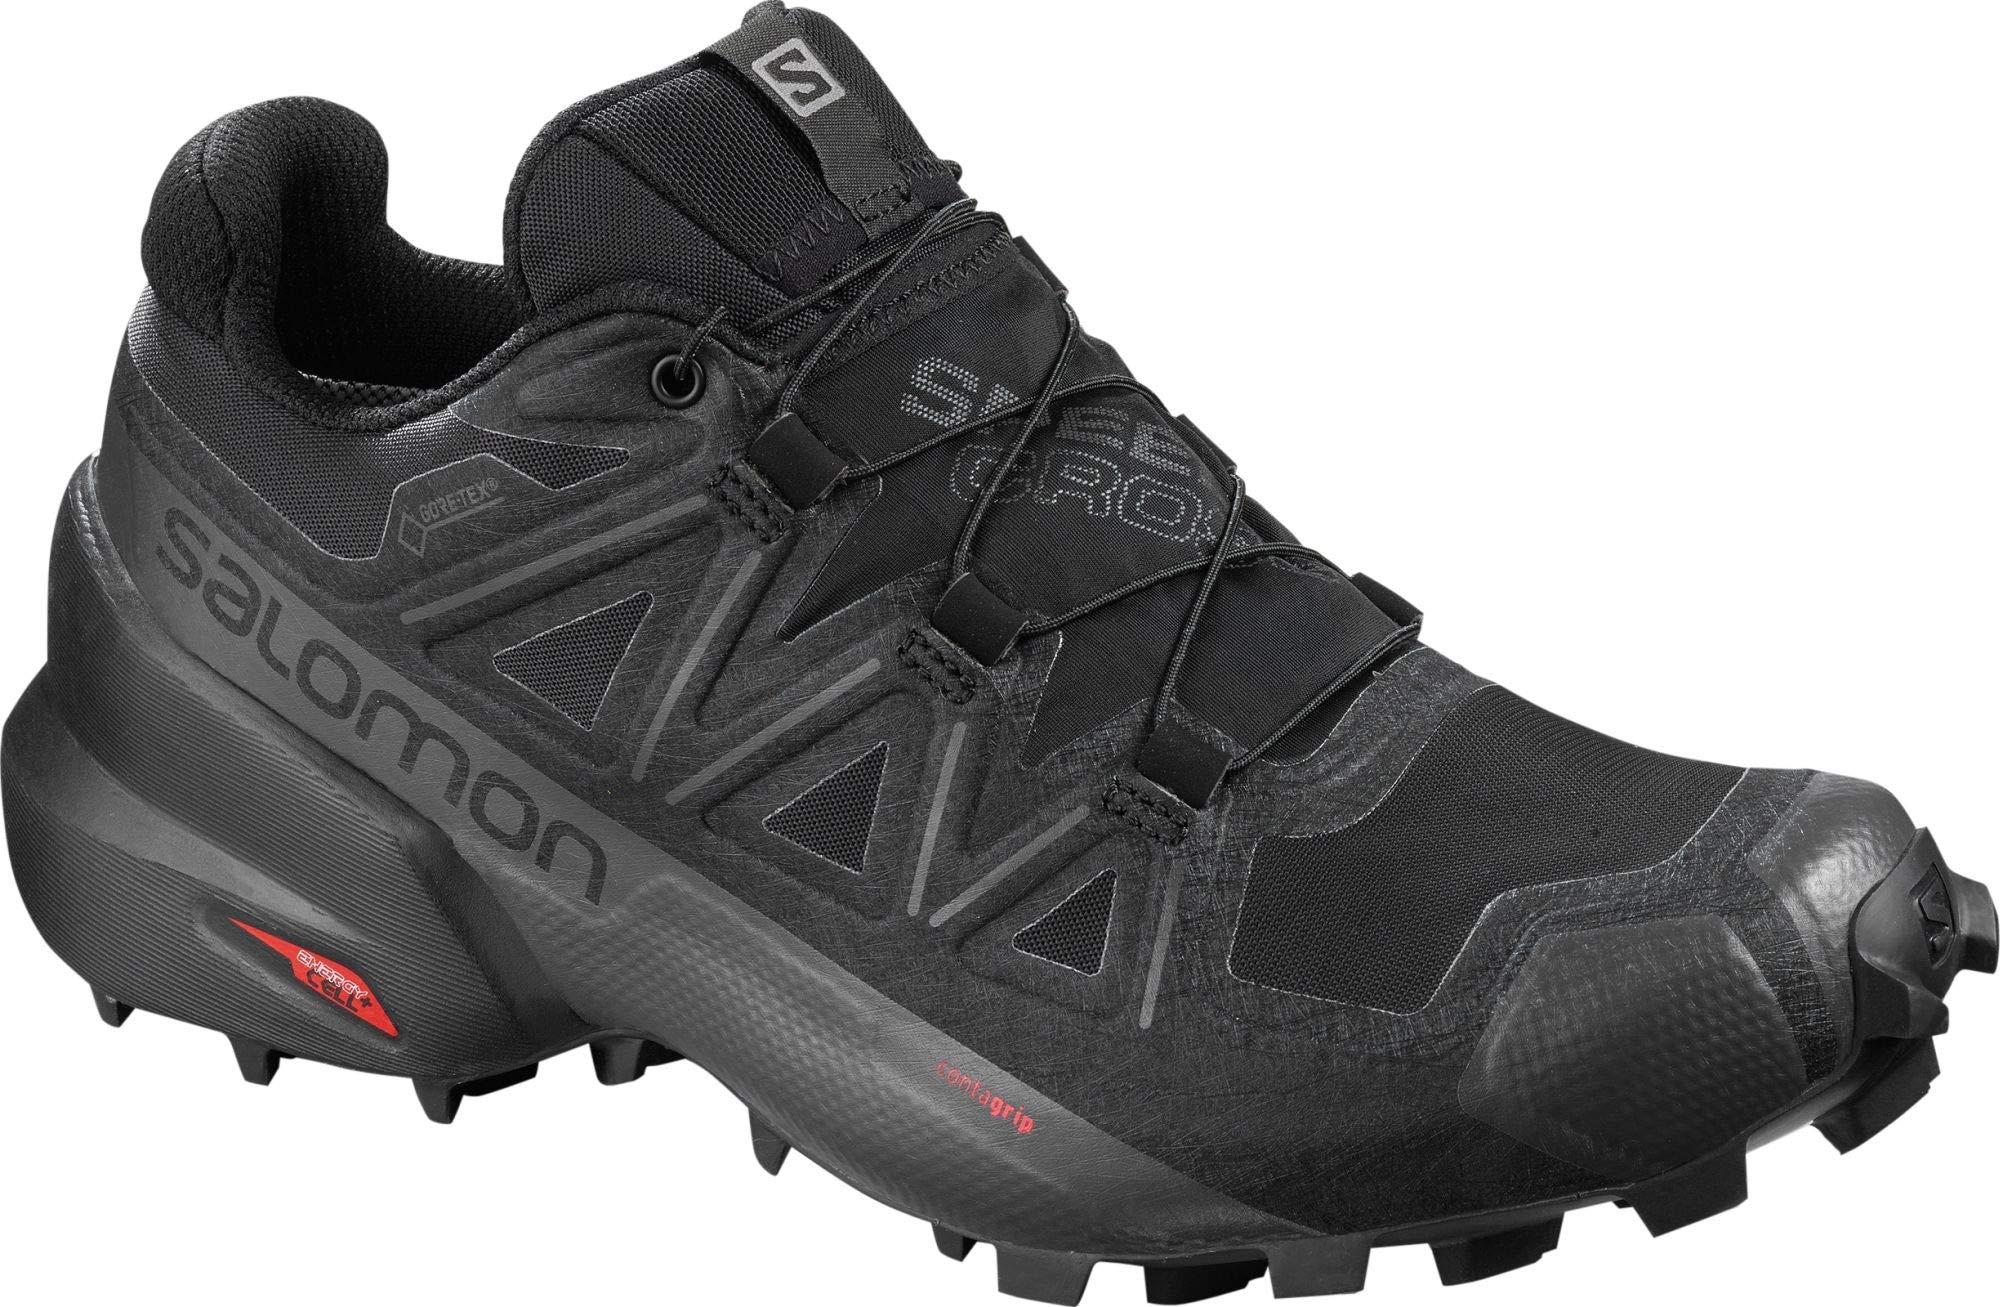 Salomon Women's Speedcross 5 GTX Trail Running Shoes, Black/Black/PHANTOM, 5 by SALOMON